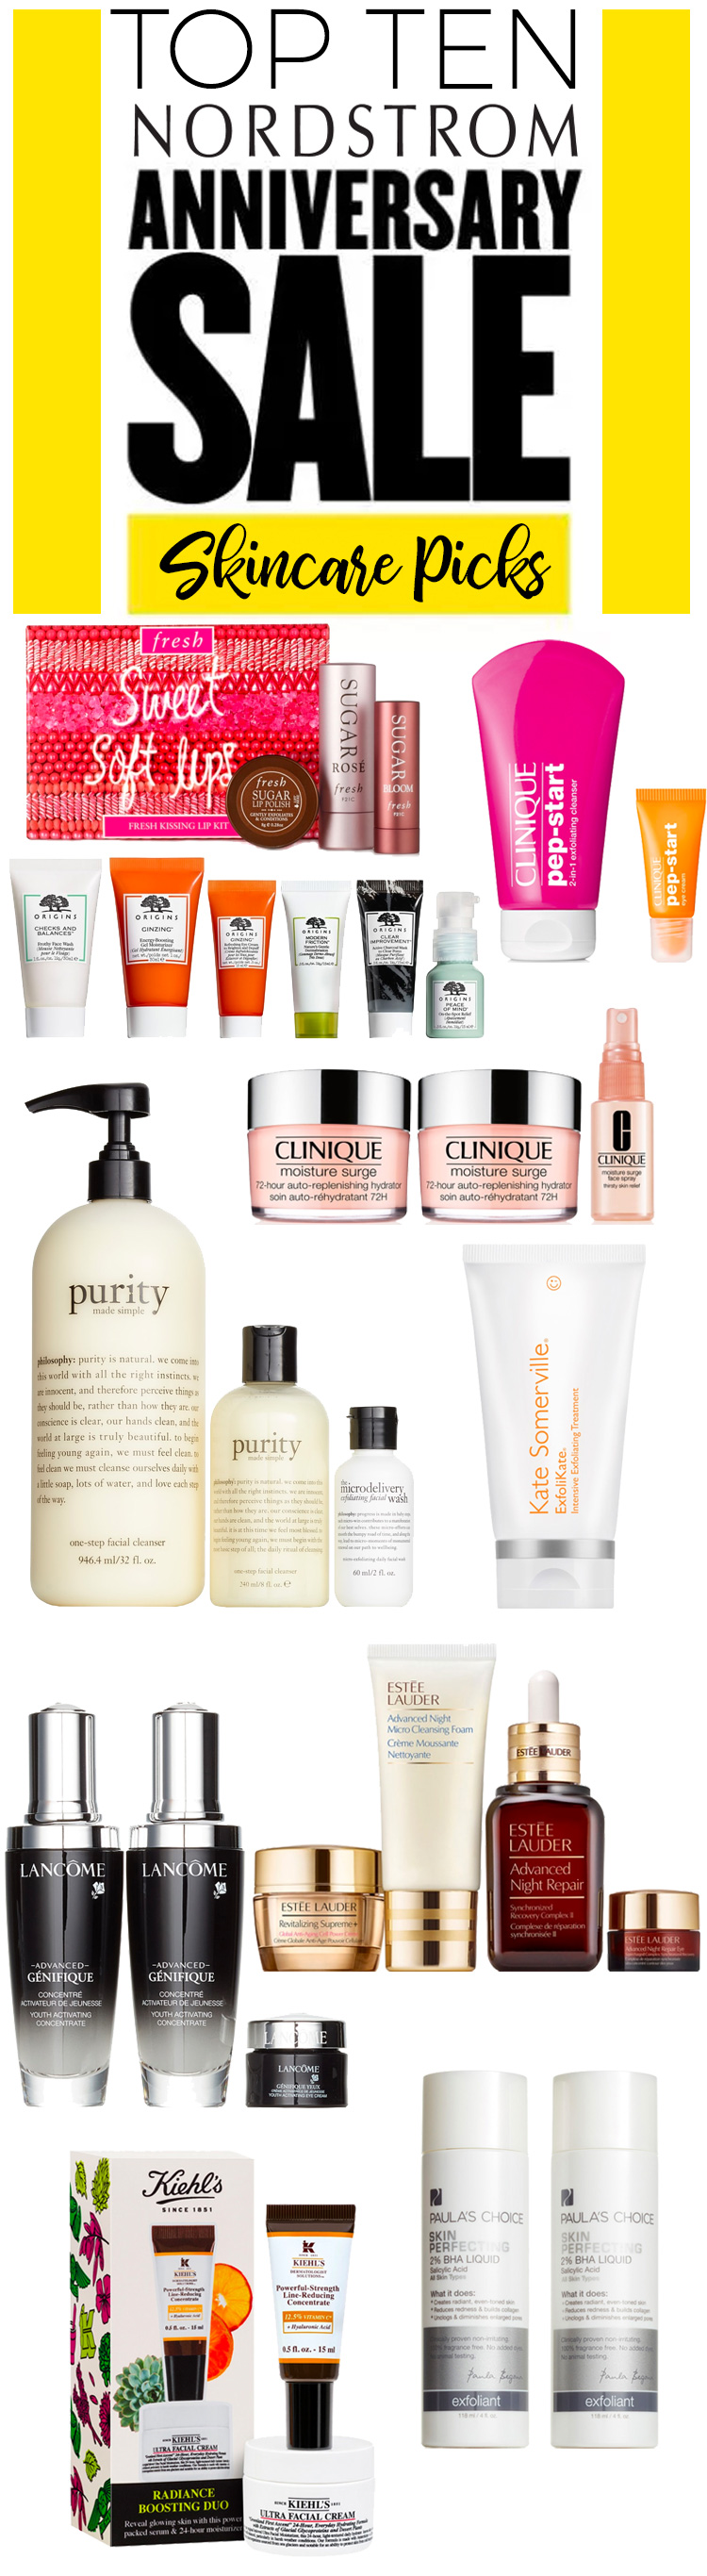 Nordstrom Anniversary Sale 2018: Top 10 Skincare Picks